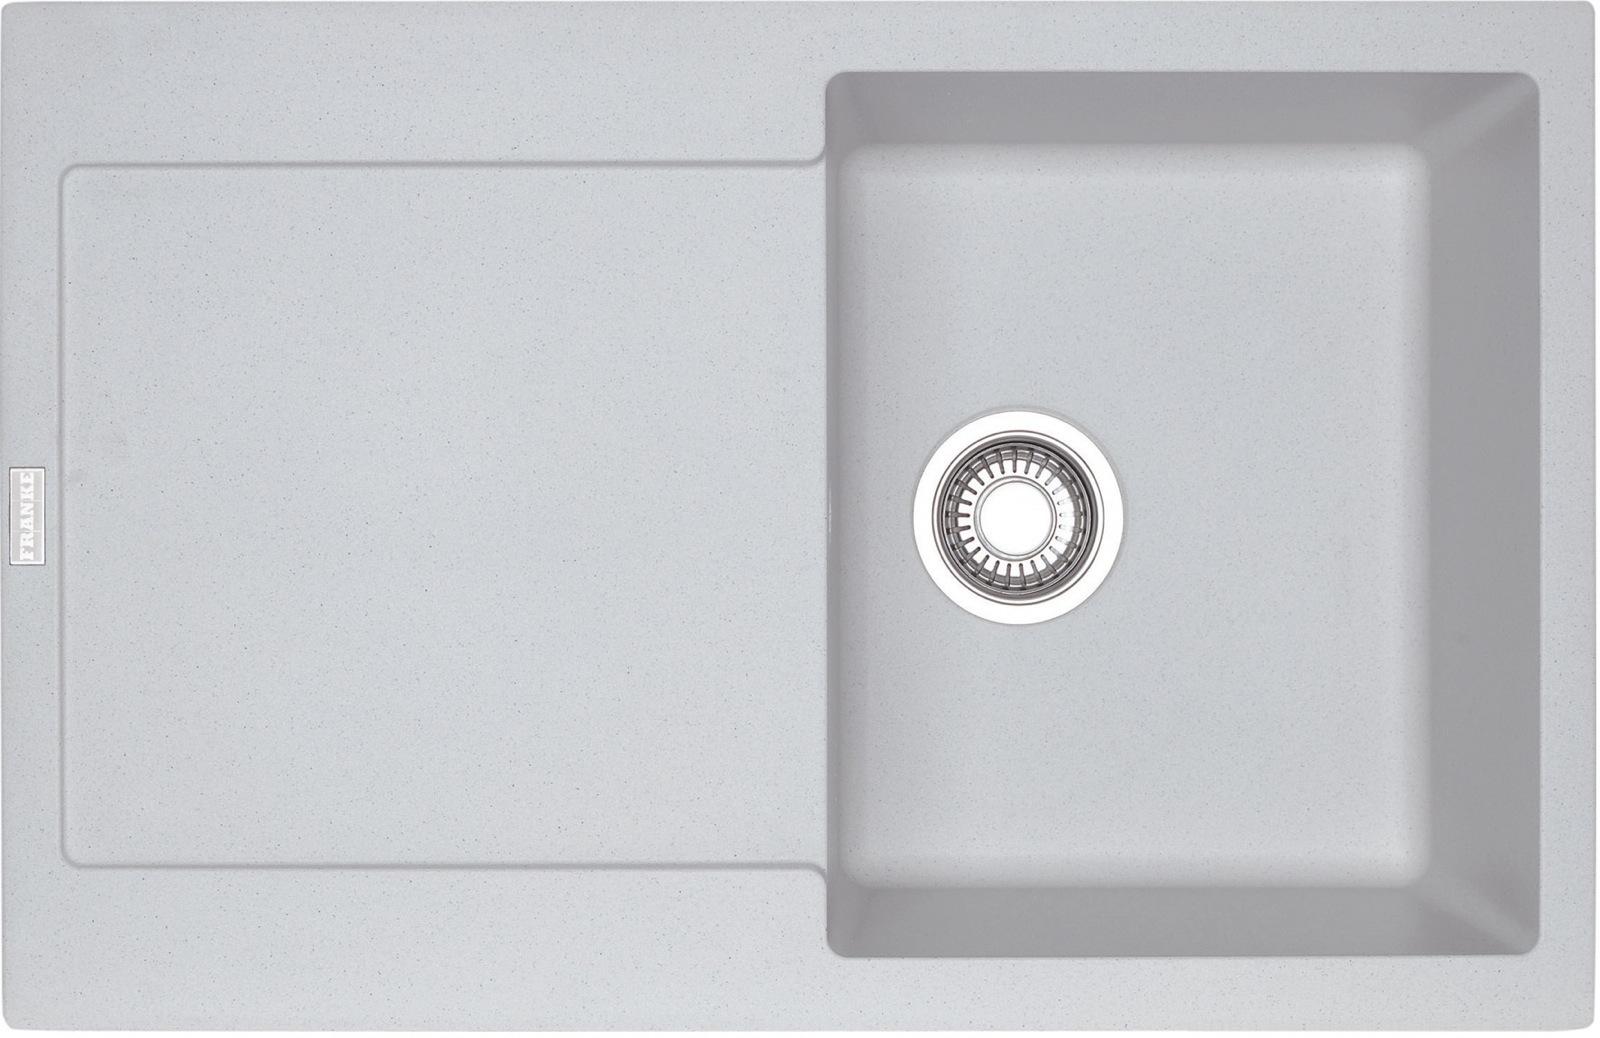 Chiuveta bucatarie fragranite Franke Maris MRG 611 reversibila 780x500mm tehnologie Sanitized Bianco imagine sensodays.ro